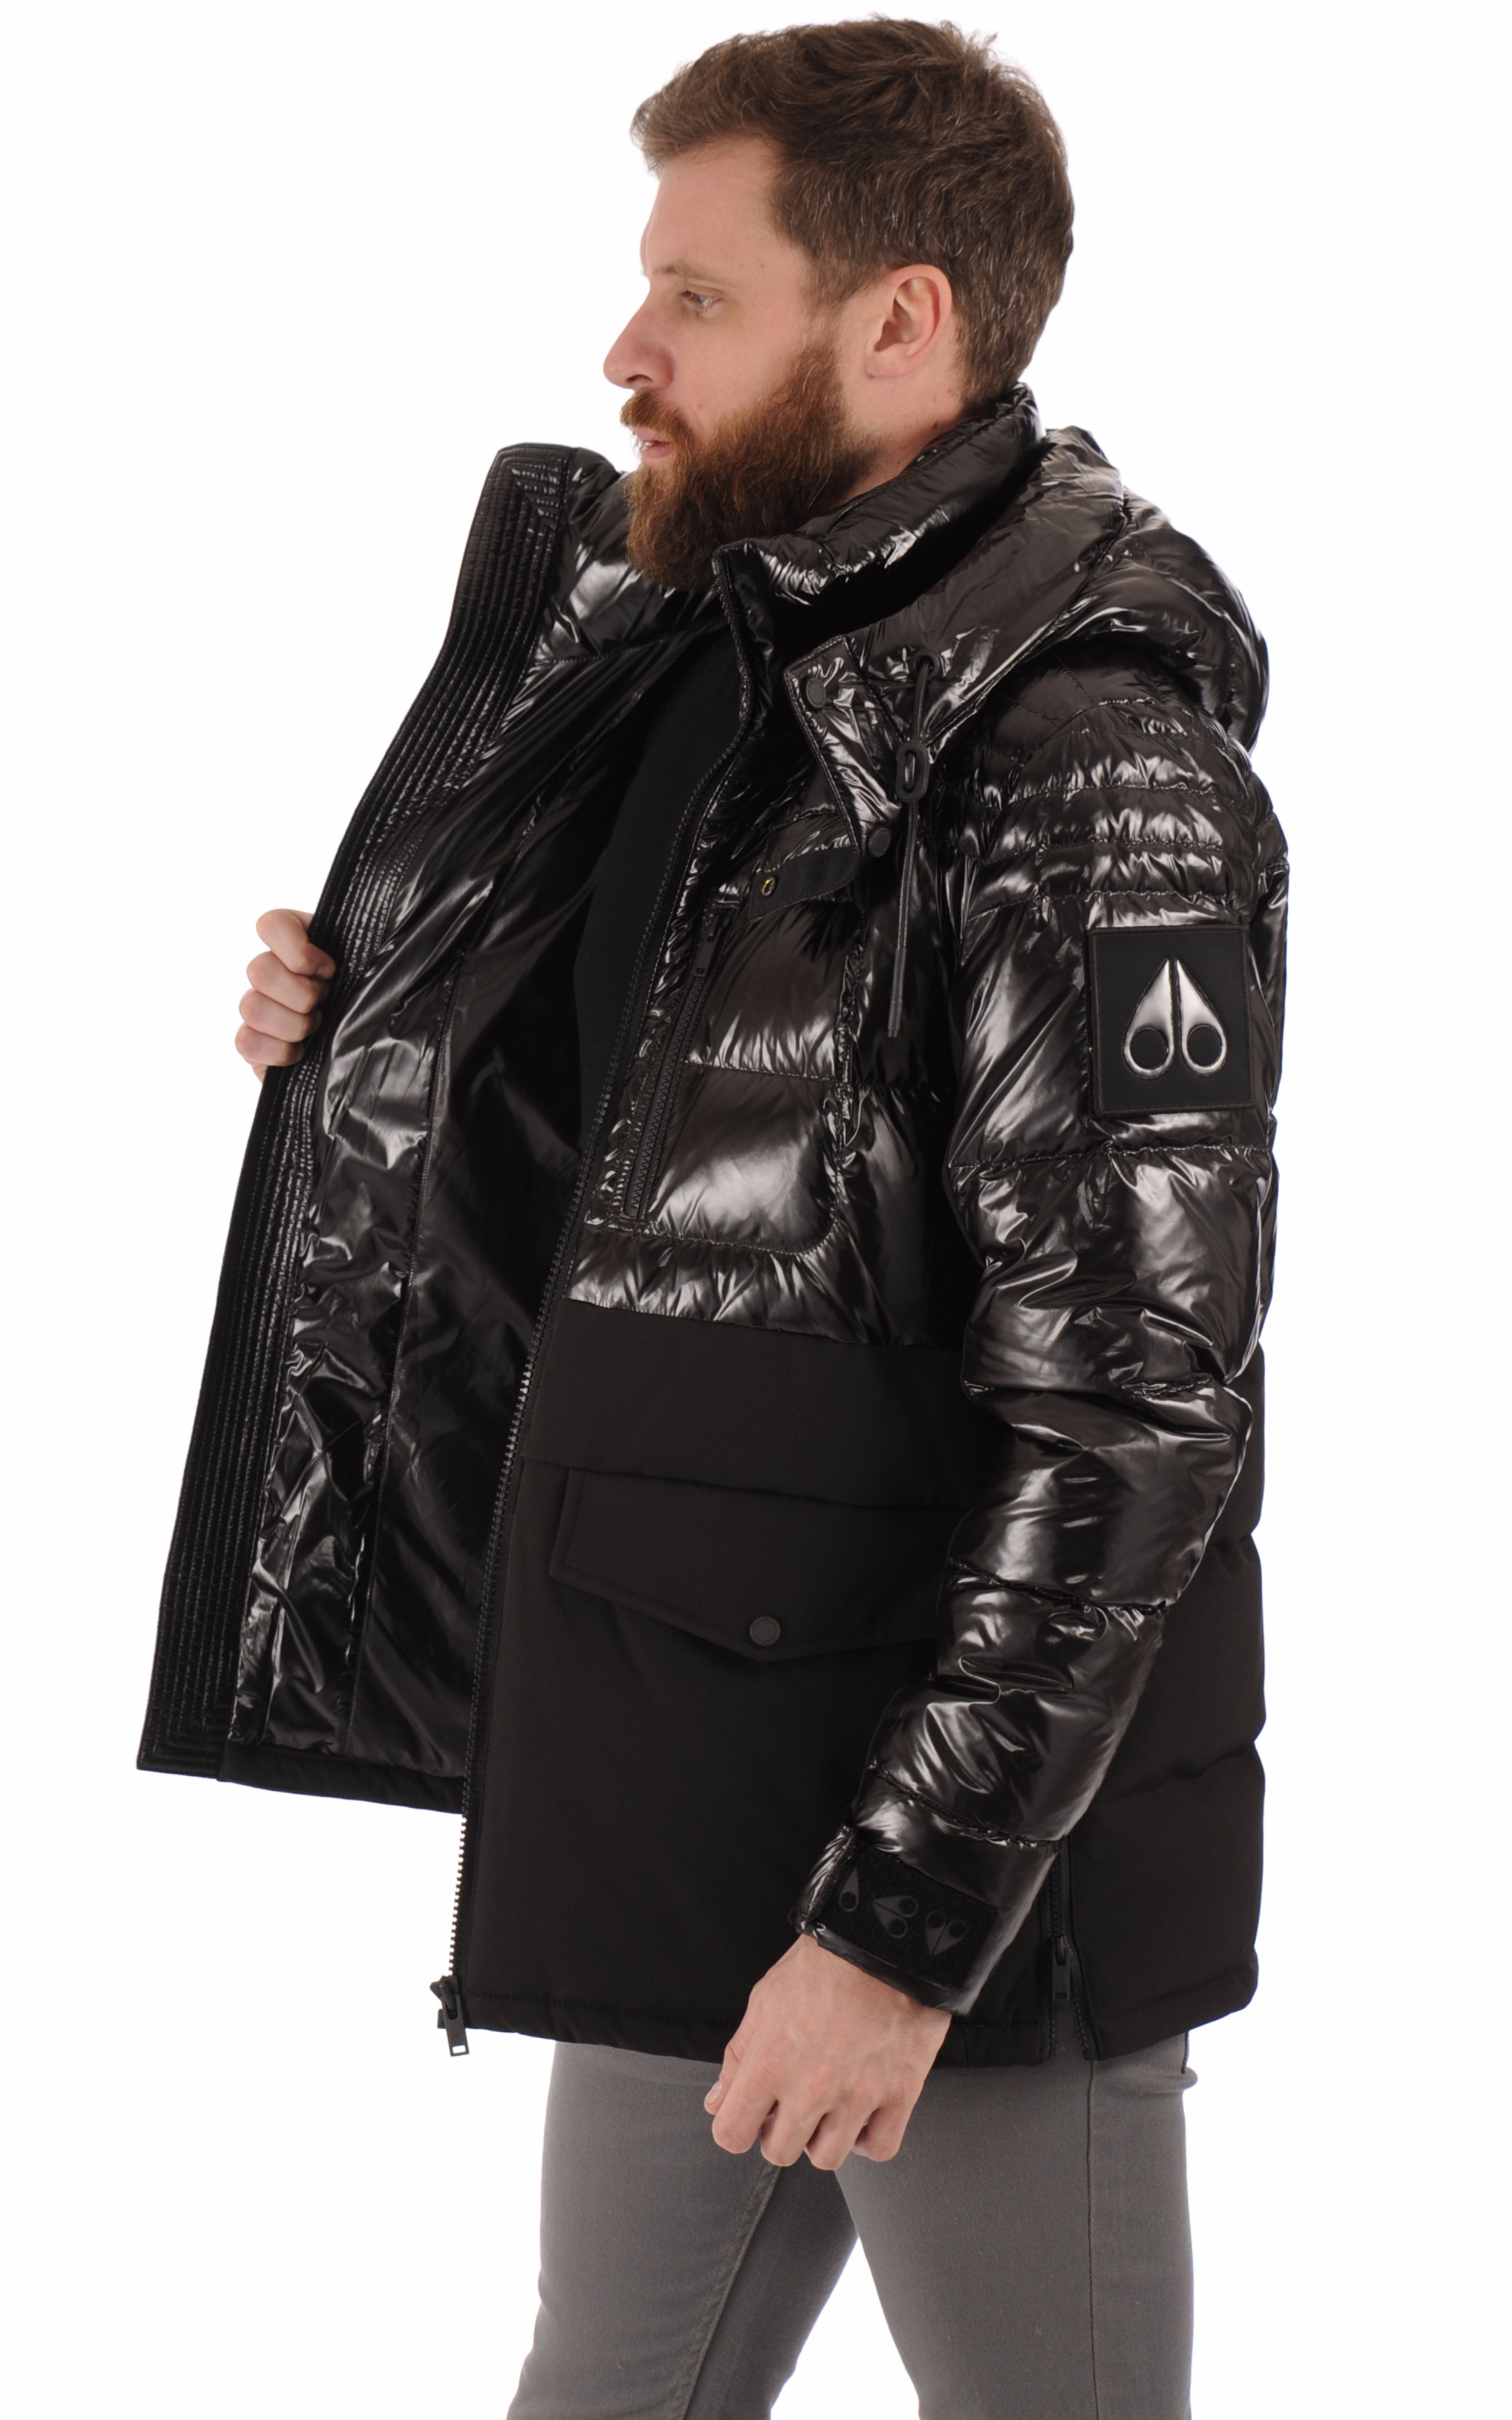 Doudoune bi-matière DUGALD noir Moose Knuckles